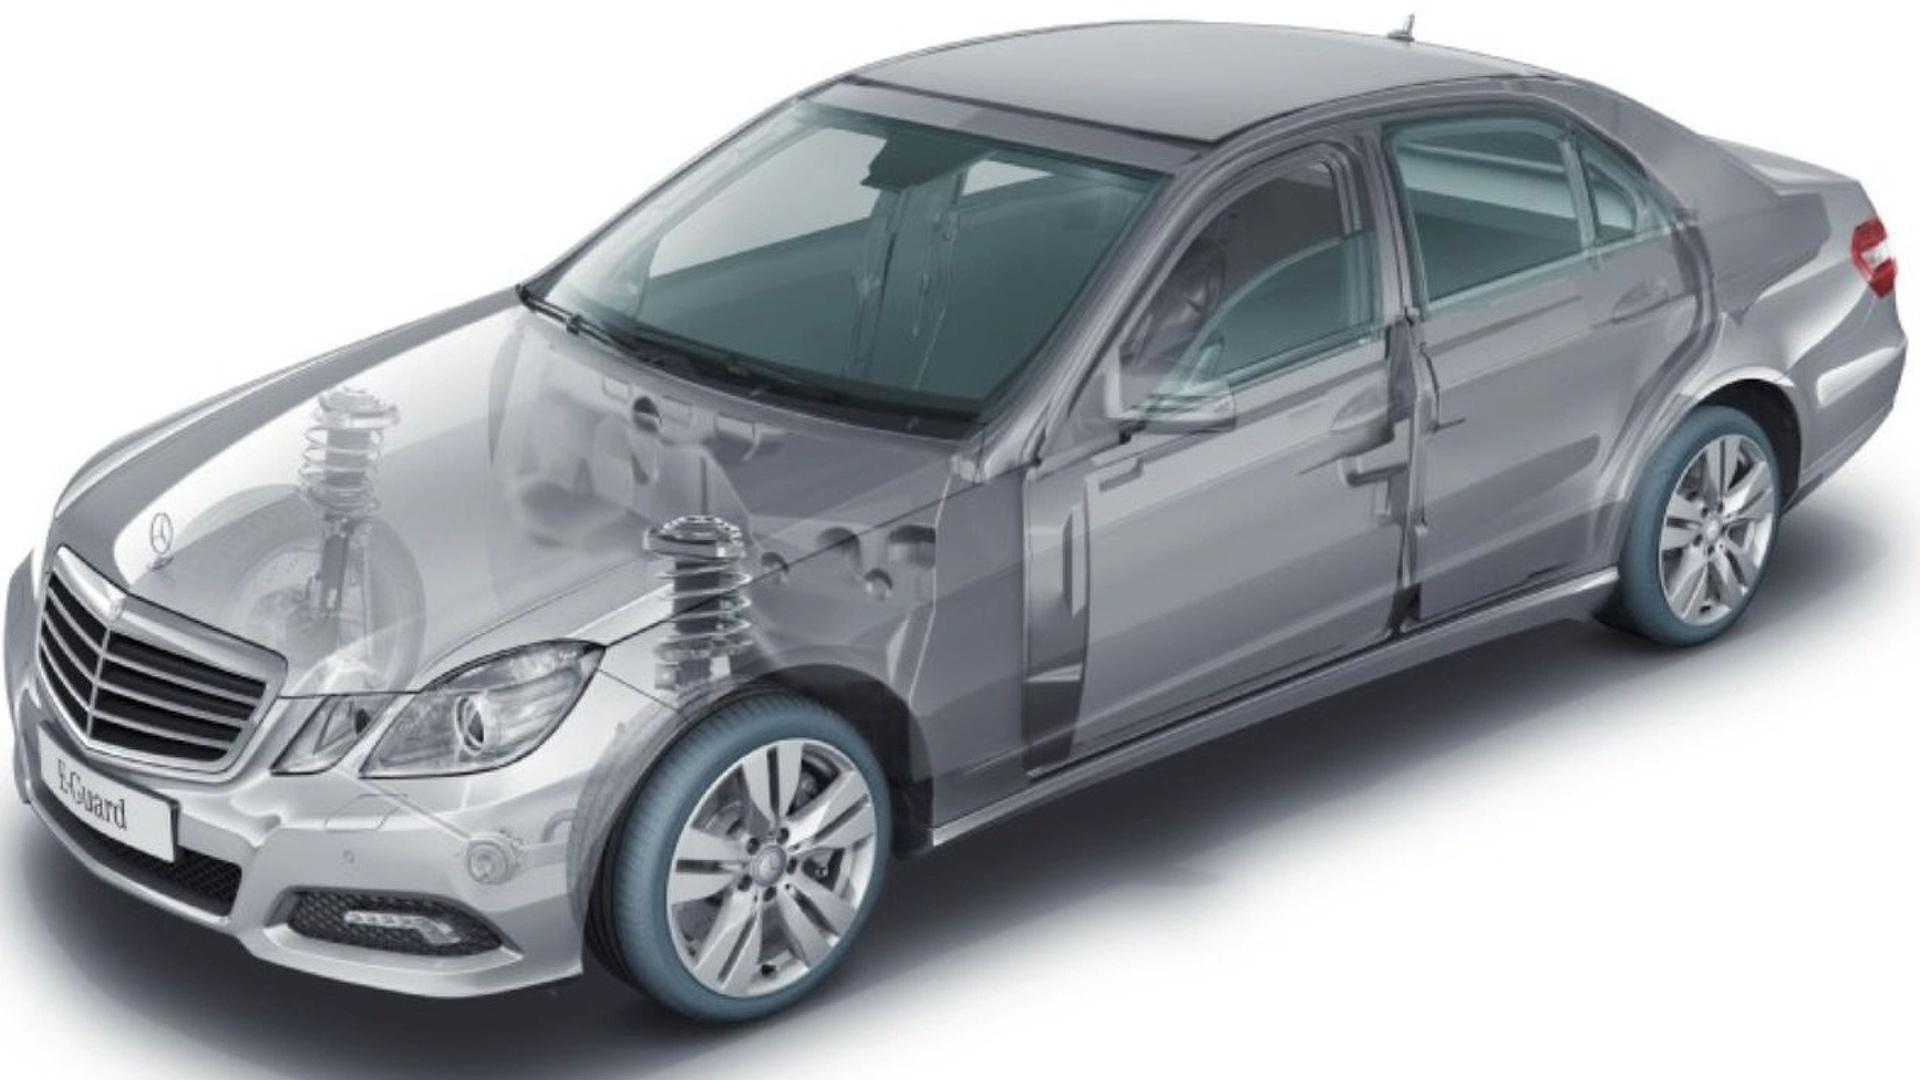 New 2010 Mercedes-Benz E-Class Guard Model Announced